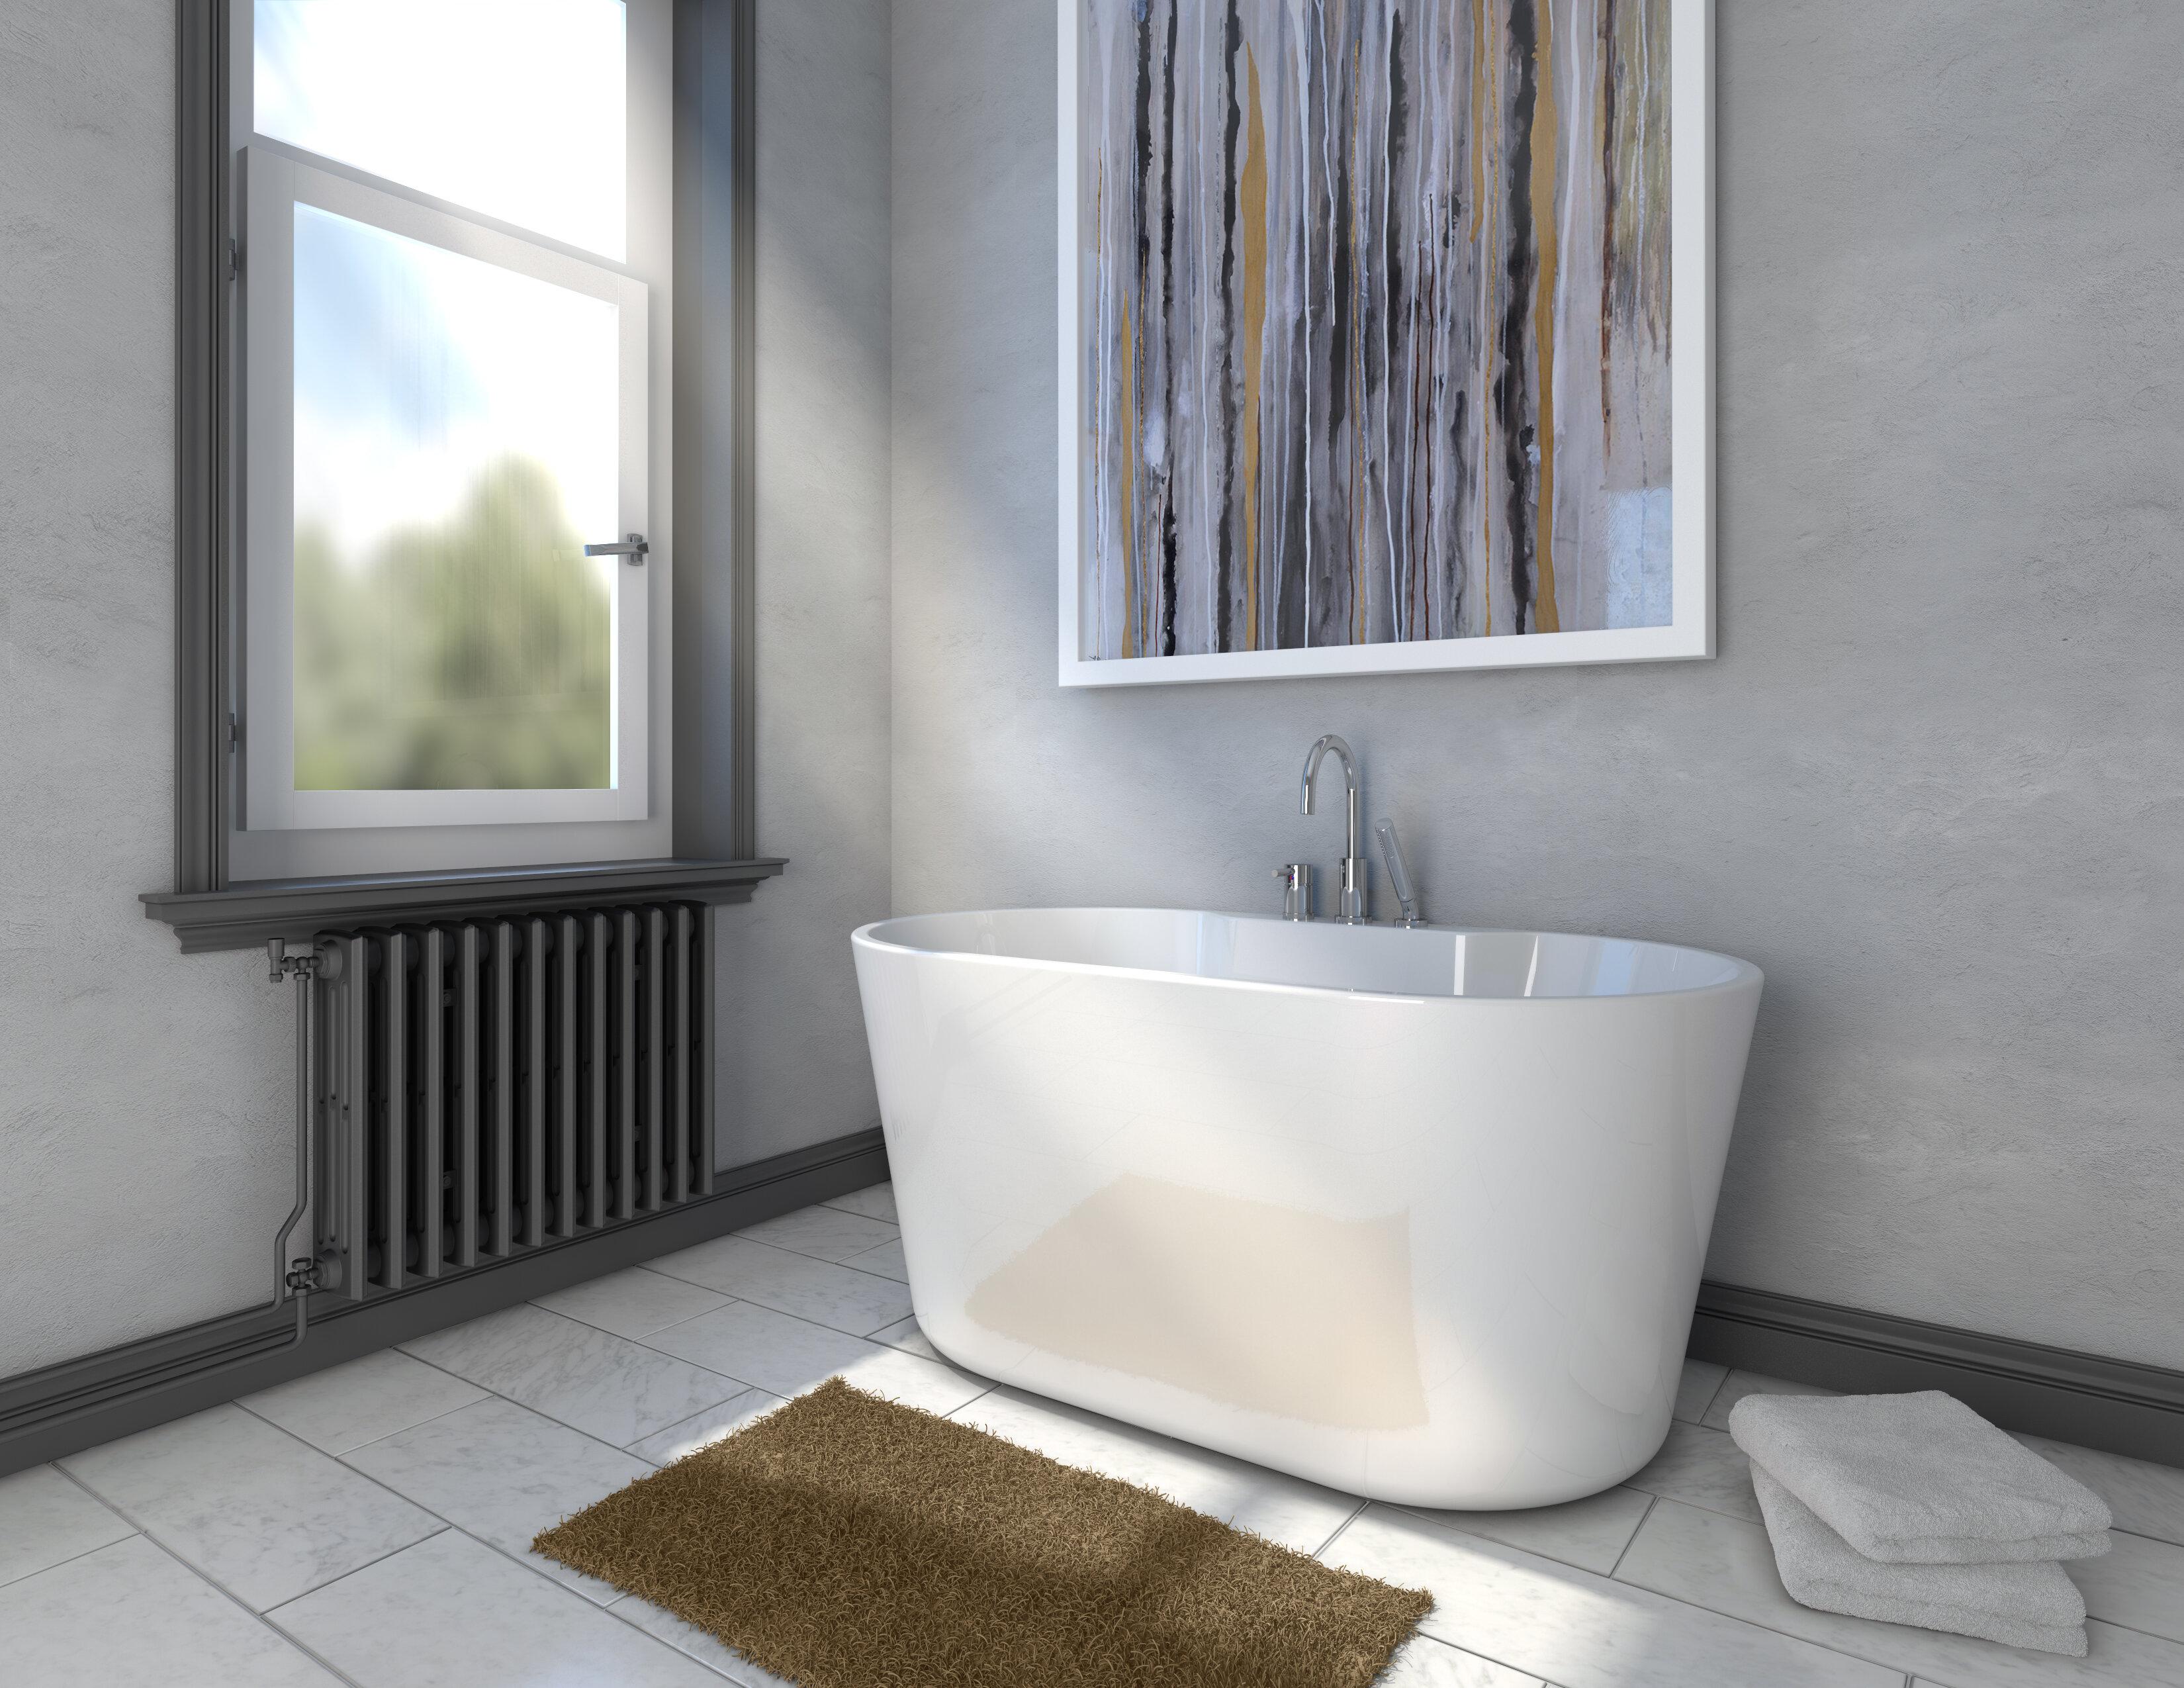 56 X 31 4 Freestanding Soaking Bathtub